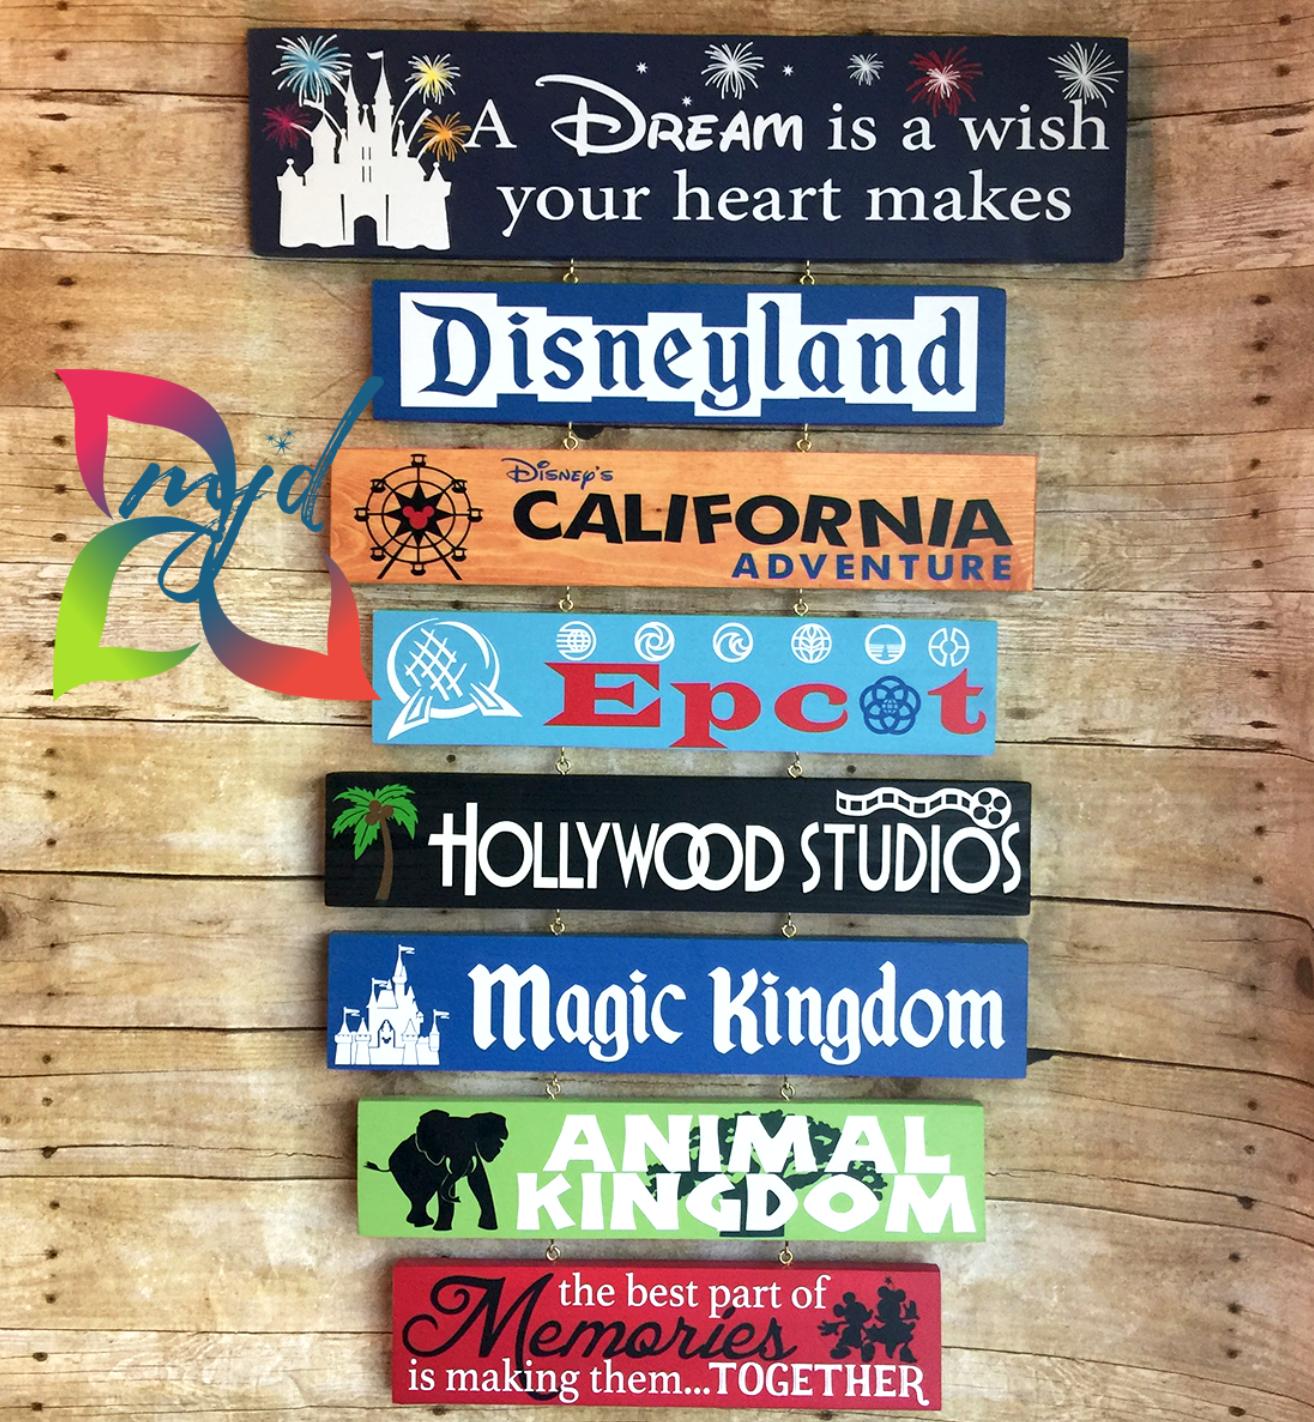 Magical JOY Designs - Magical Joy Designs